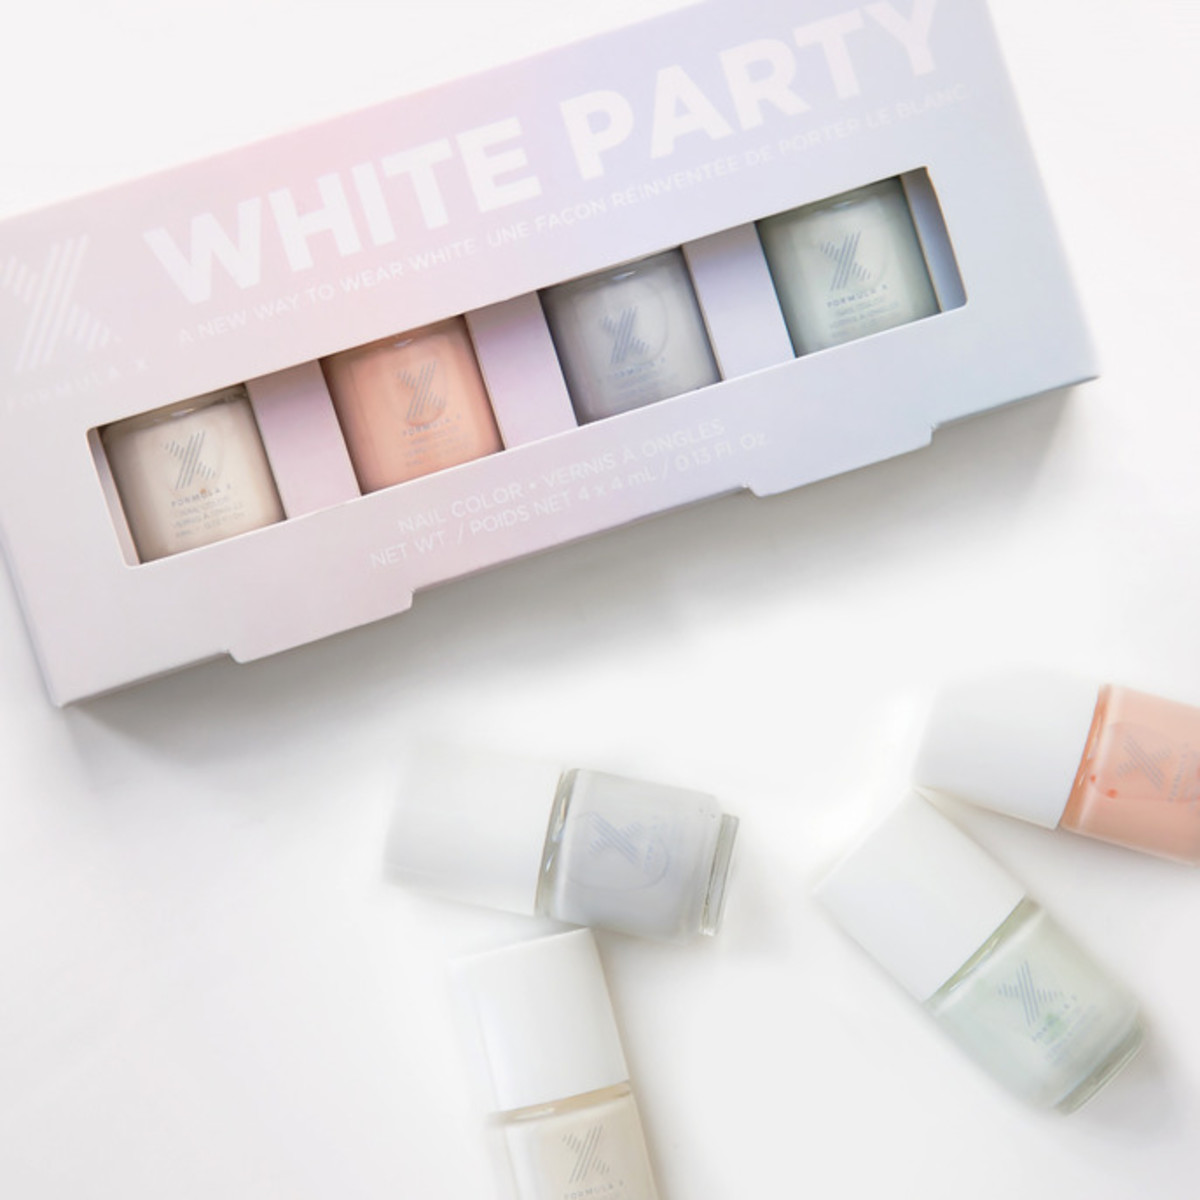 Formula X White Party 2015